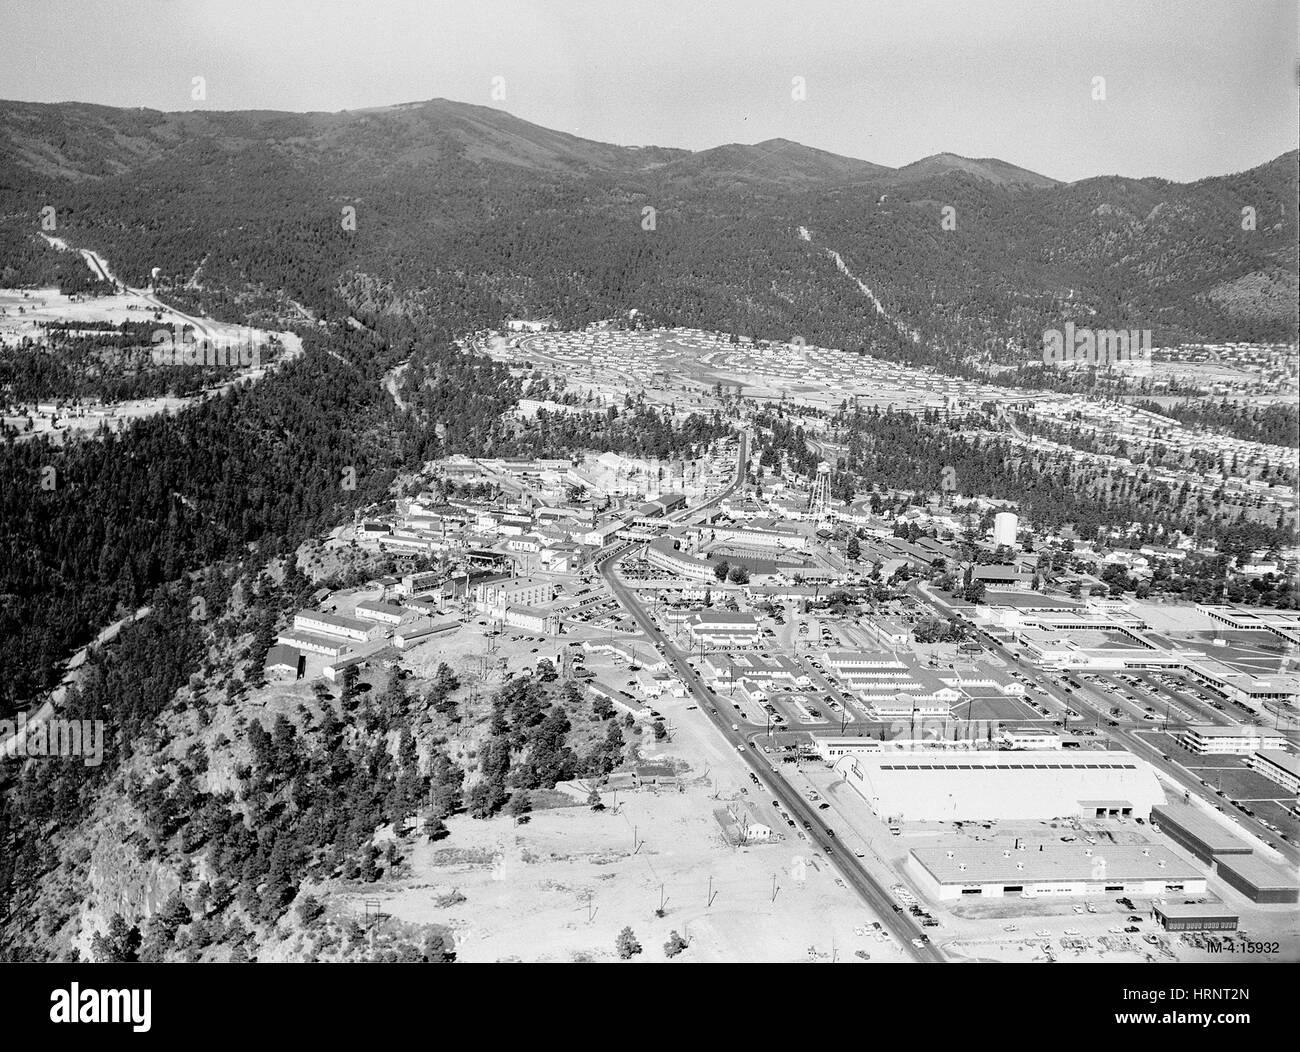 Los Alamos, 1950 - Stock Image